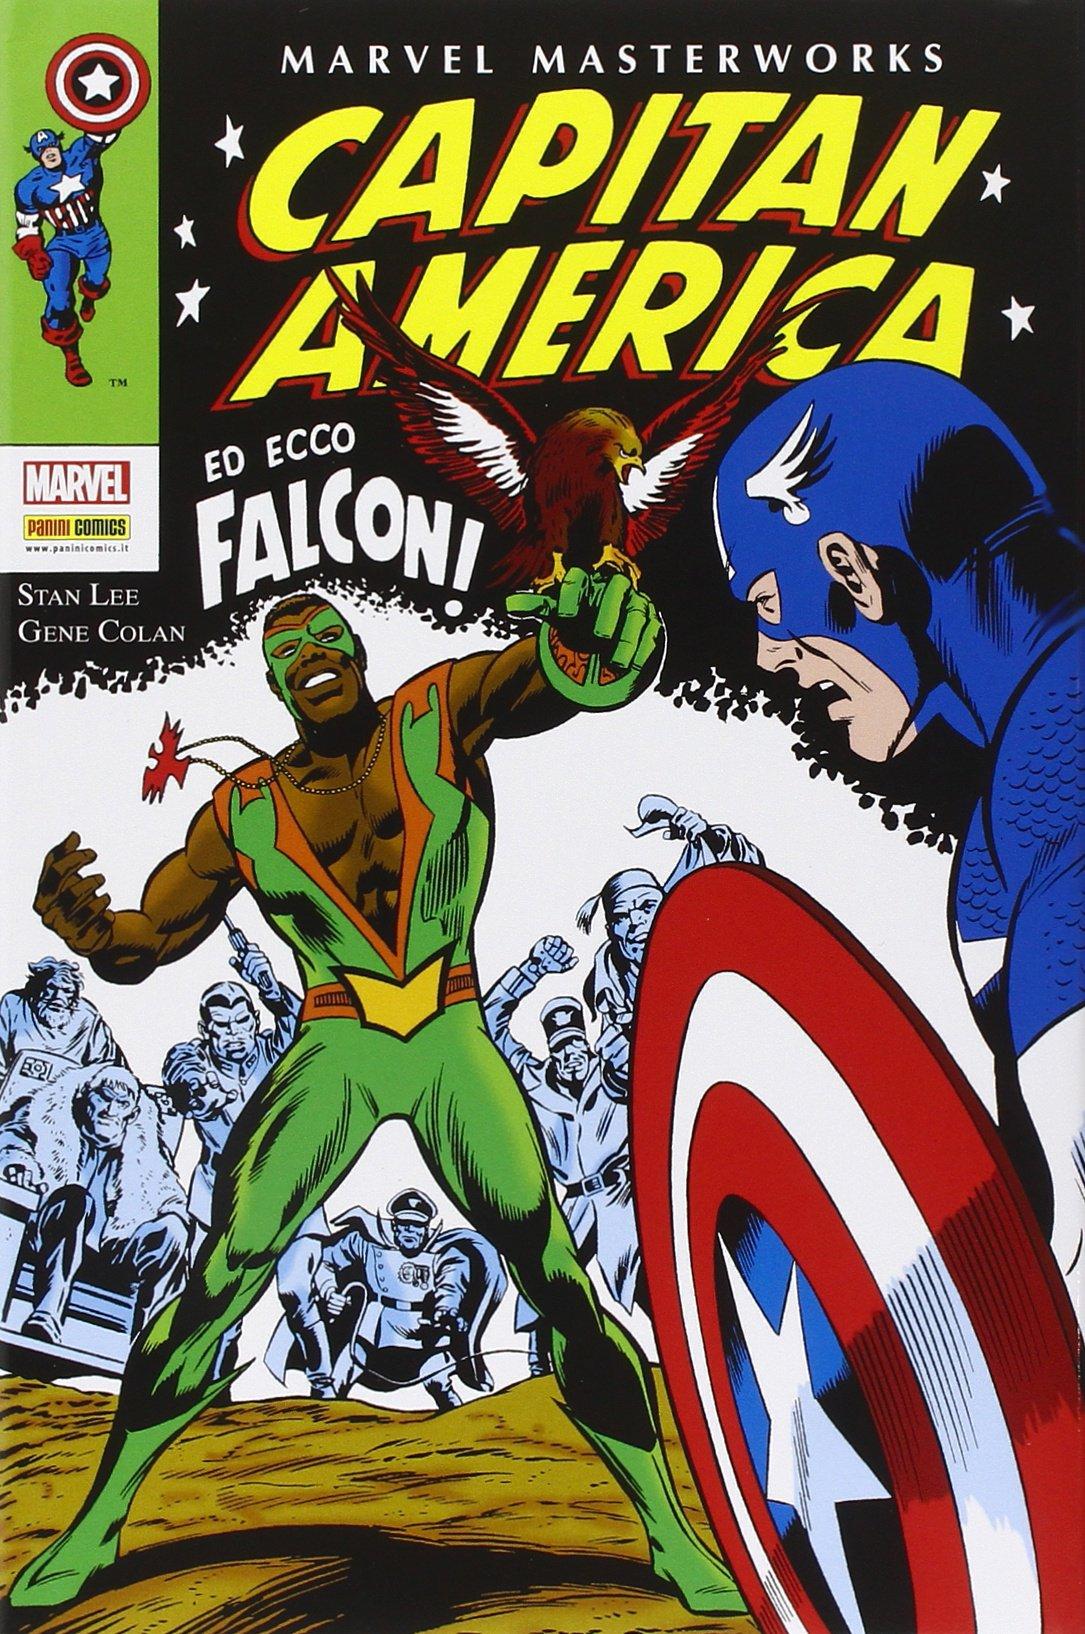 Marvel Masterworks: Capitan America vol. 4